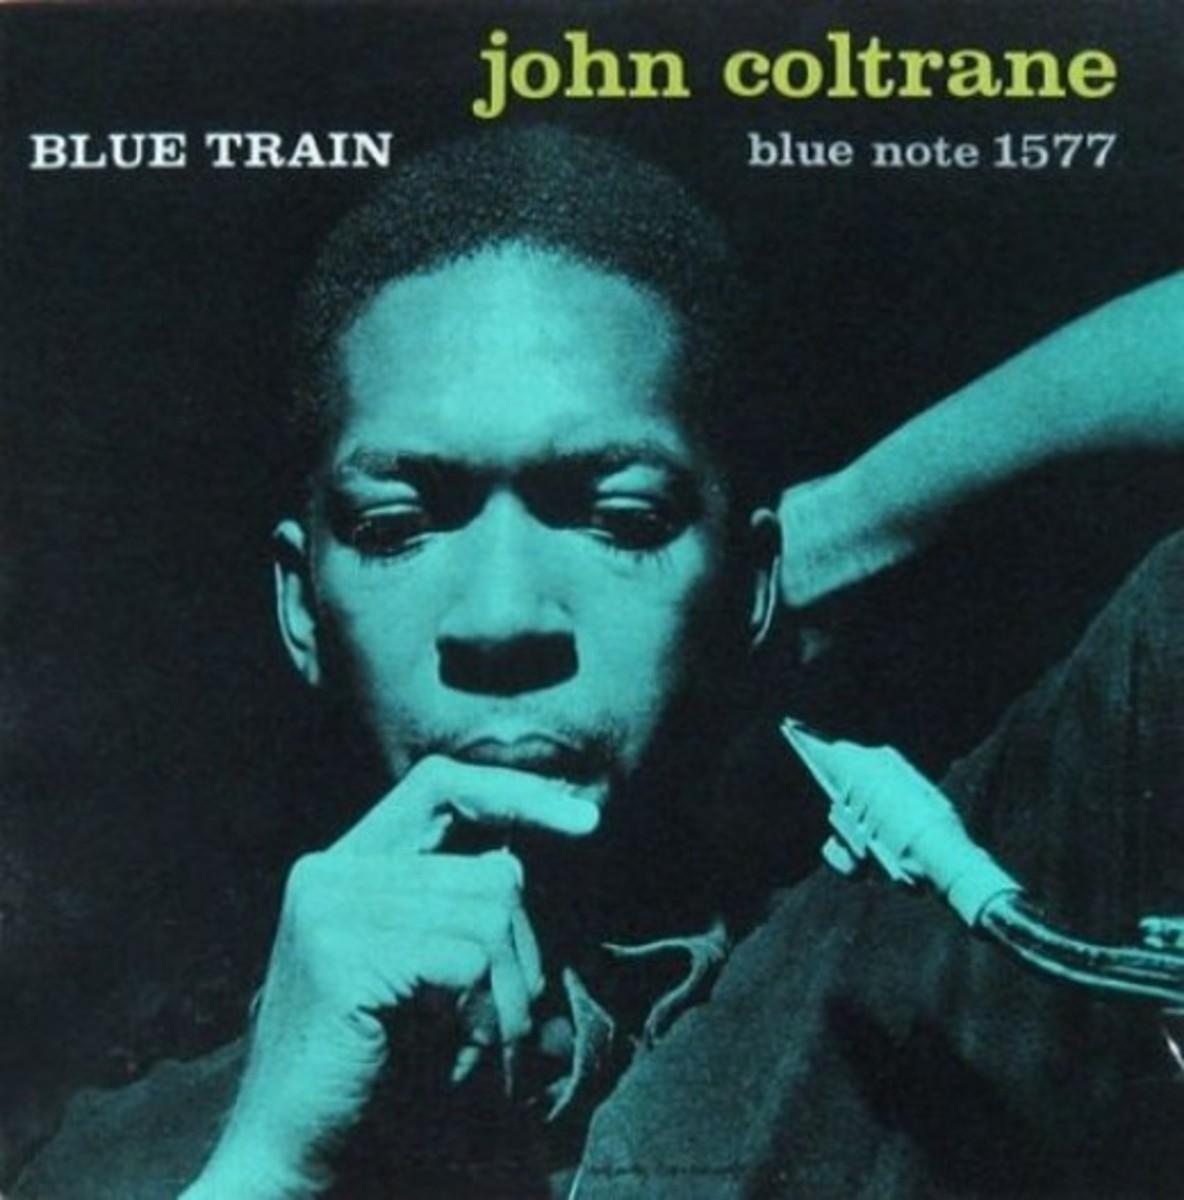 "John Coltrane ""Blue Train"" Blue Note Records BLP 1577 12"" LP Vinyl Record (1957) Album Cover Design by Reid Miles Photo by Franciss Wolff"